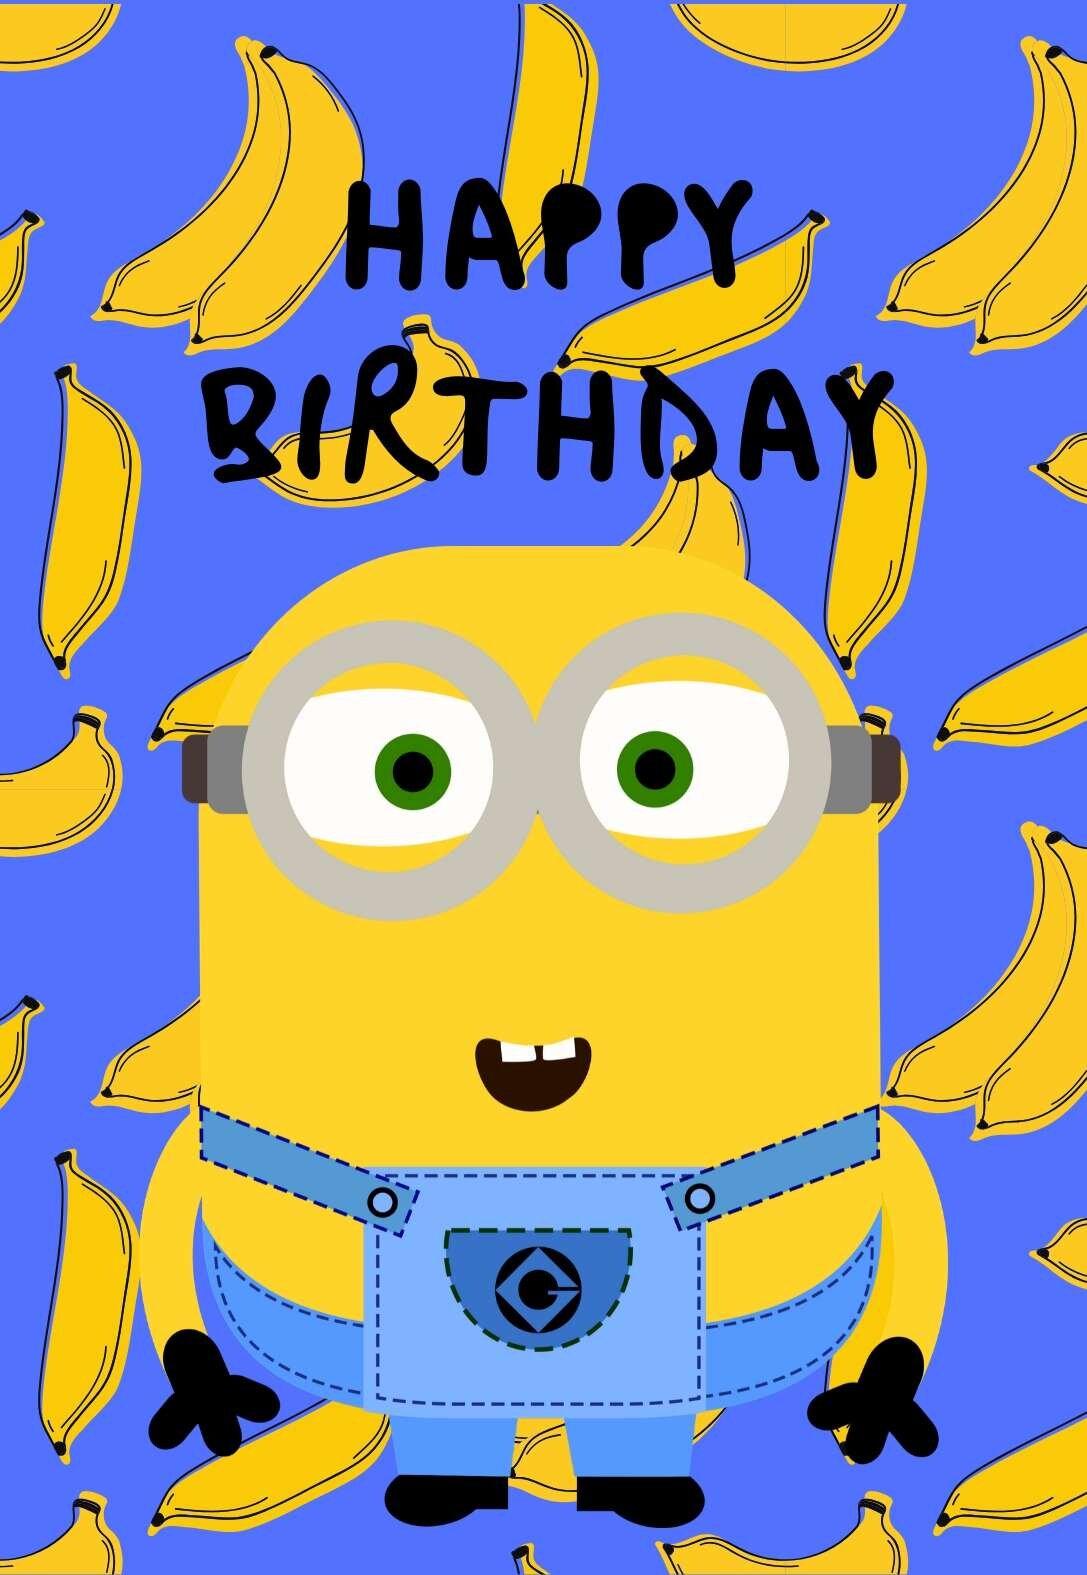 Printable Minions Birthday Cards Printbirthday Cards